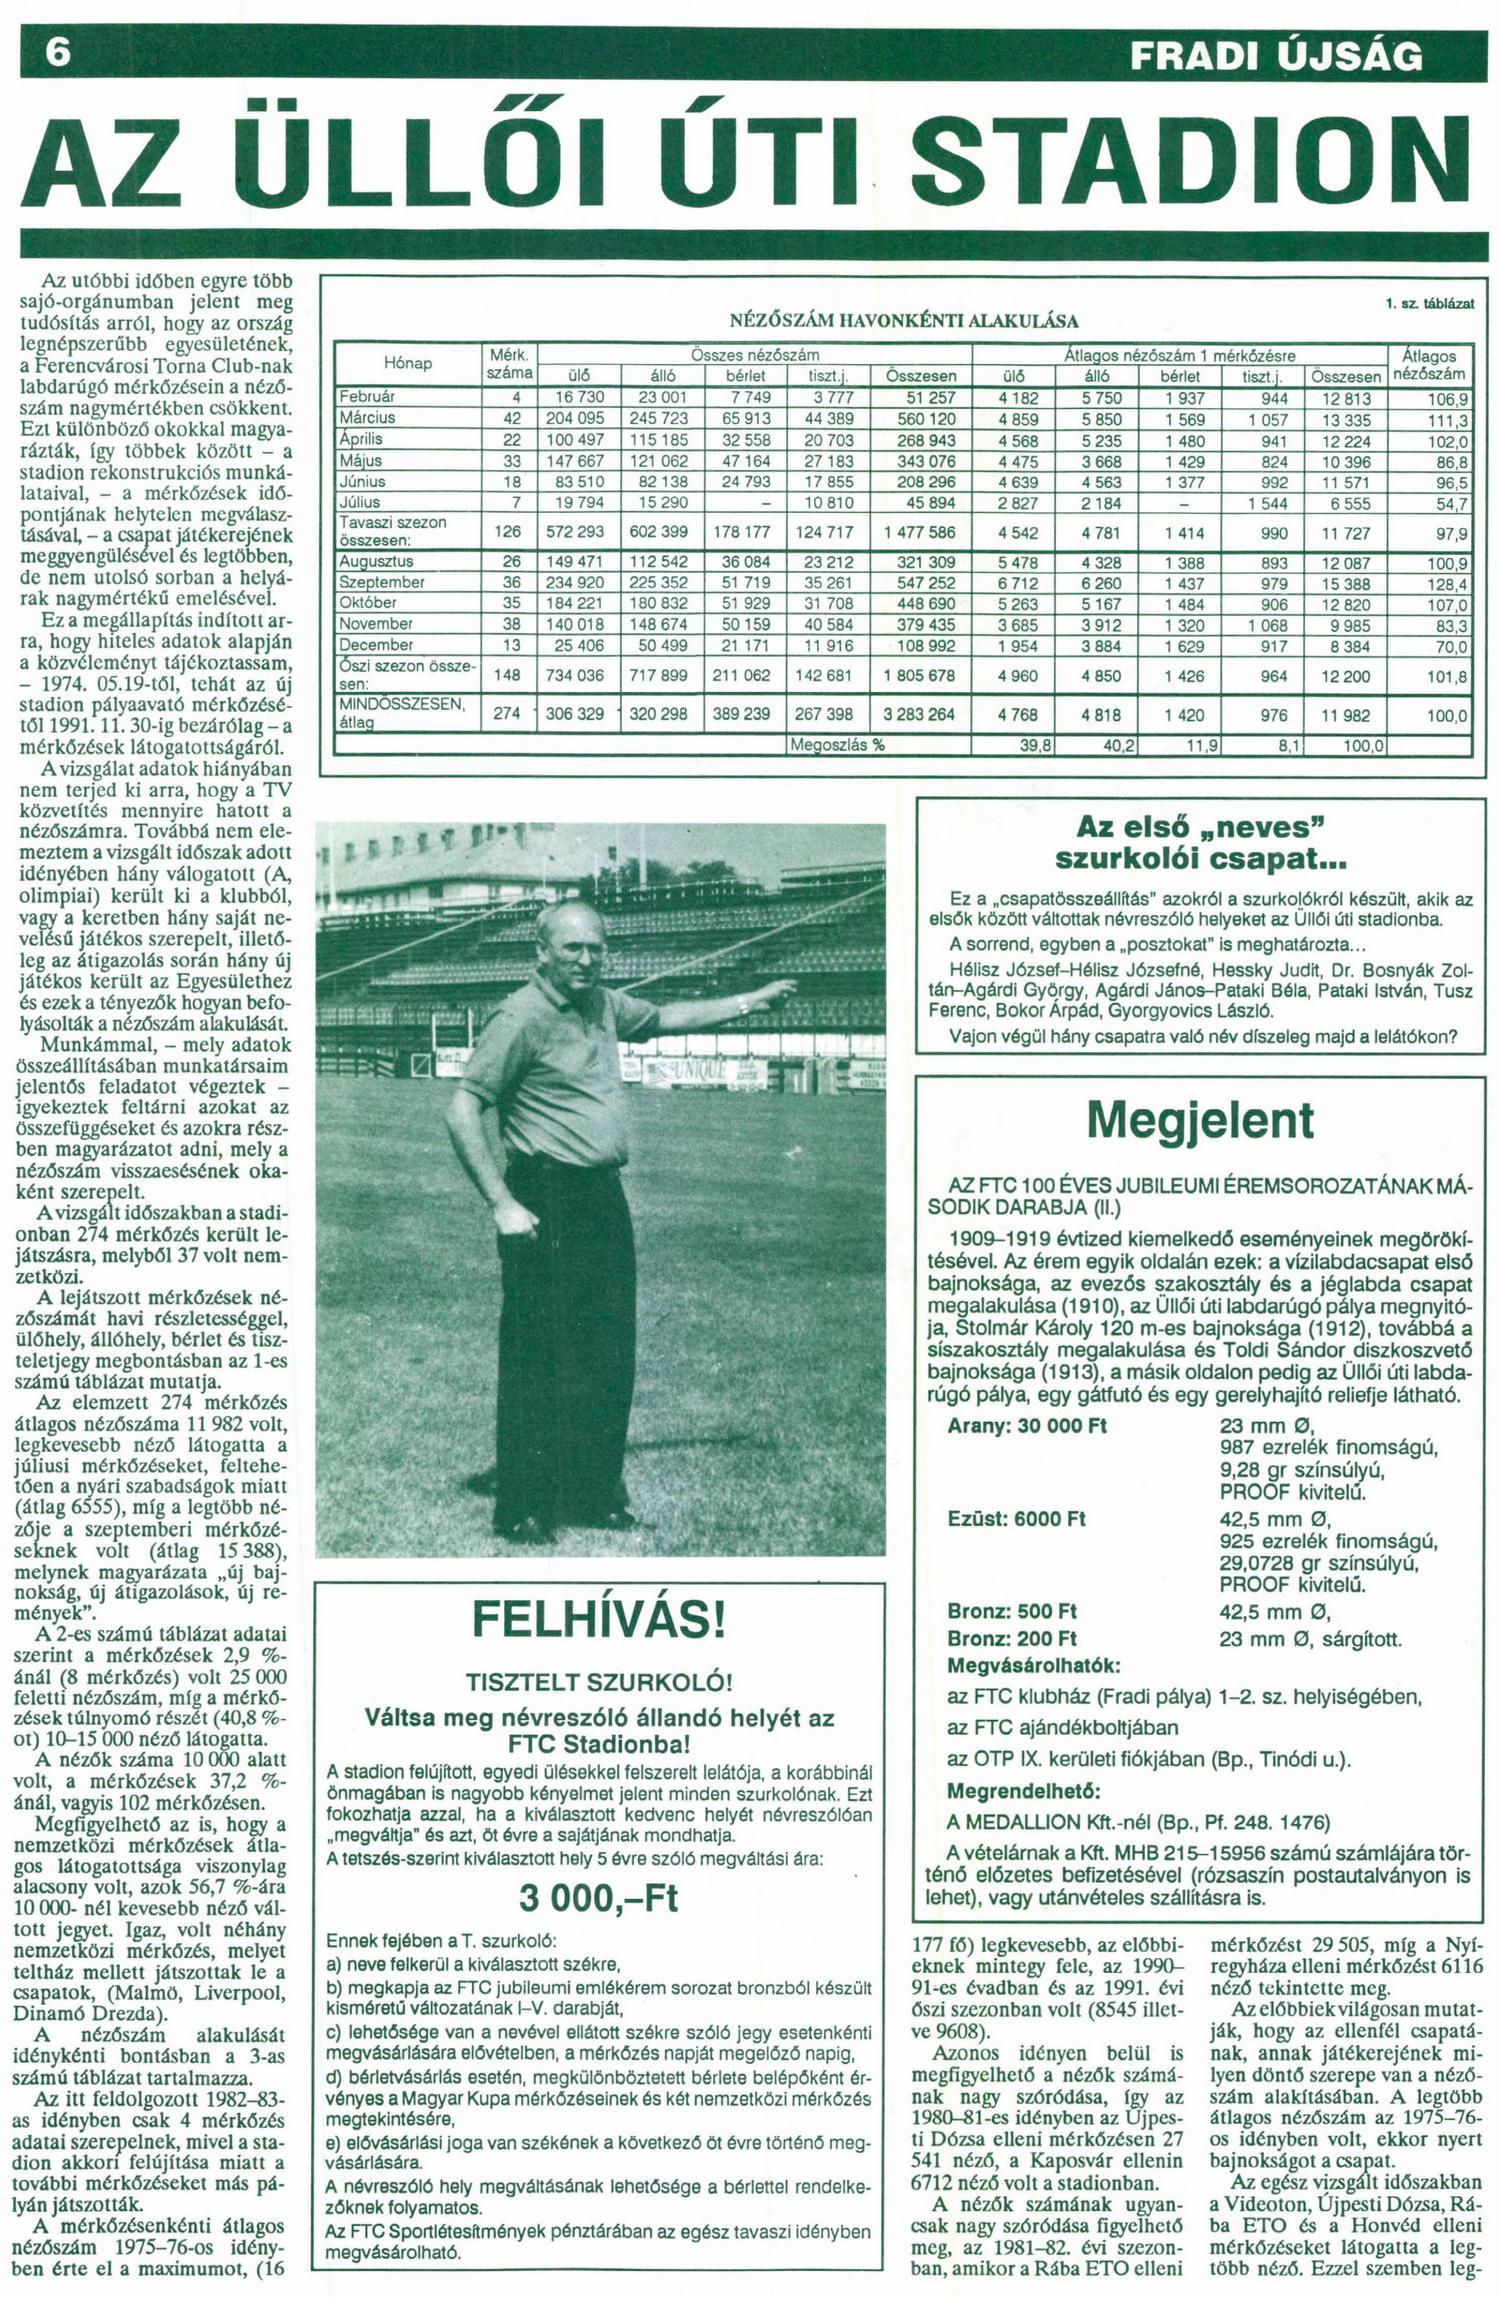 TFU_19920200_FU-Zs_001 -0006